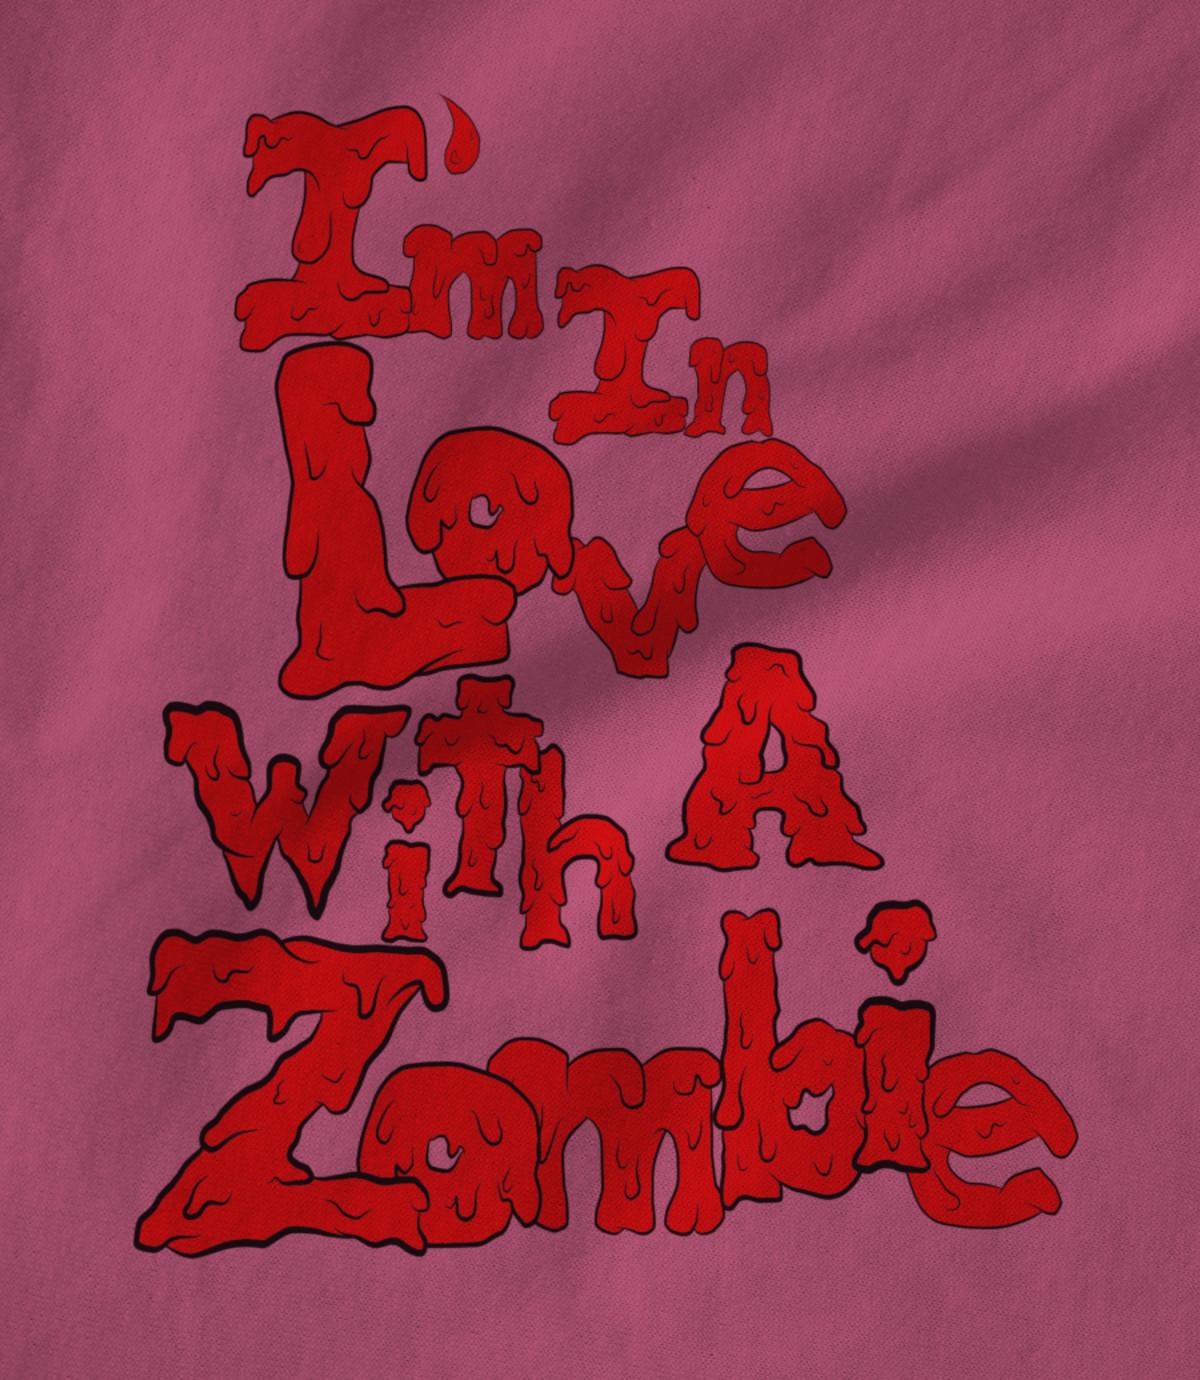 Ekc pink zombie  1538017427